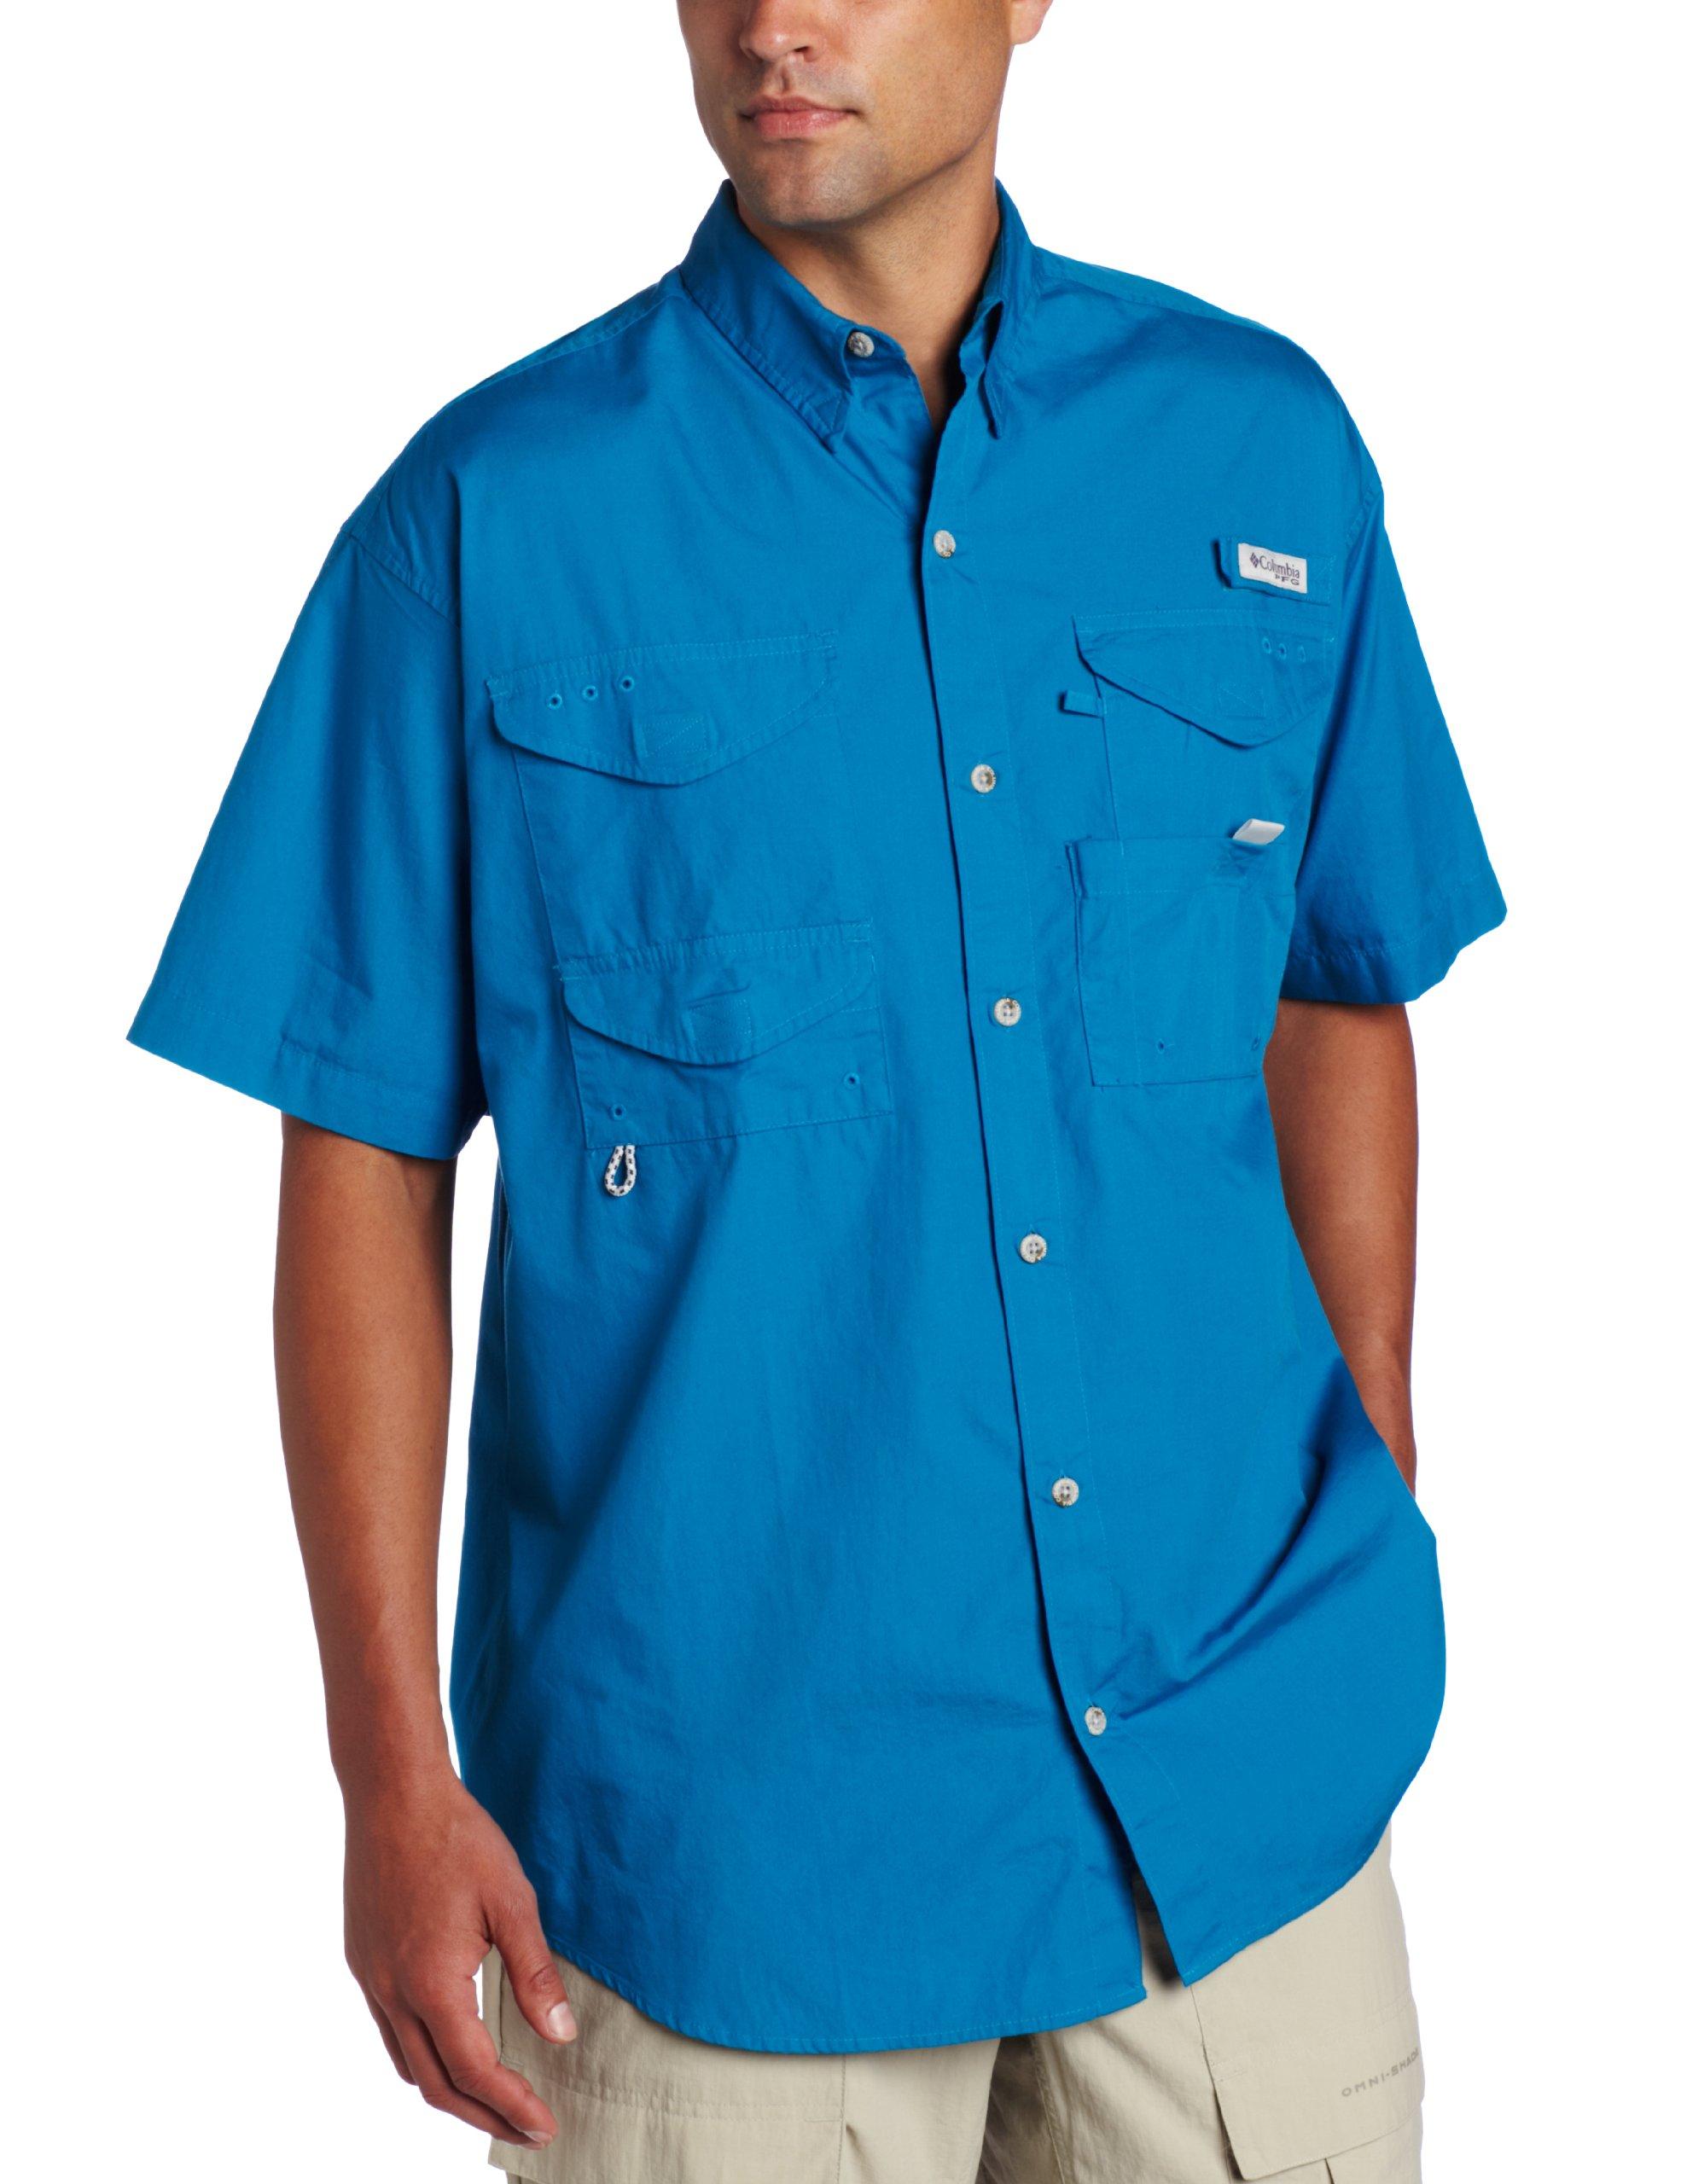 Columbia Men's Bonehead Short Sleeve Shirt, Ocean, Small